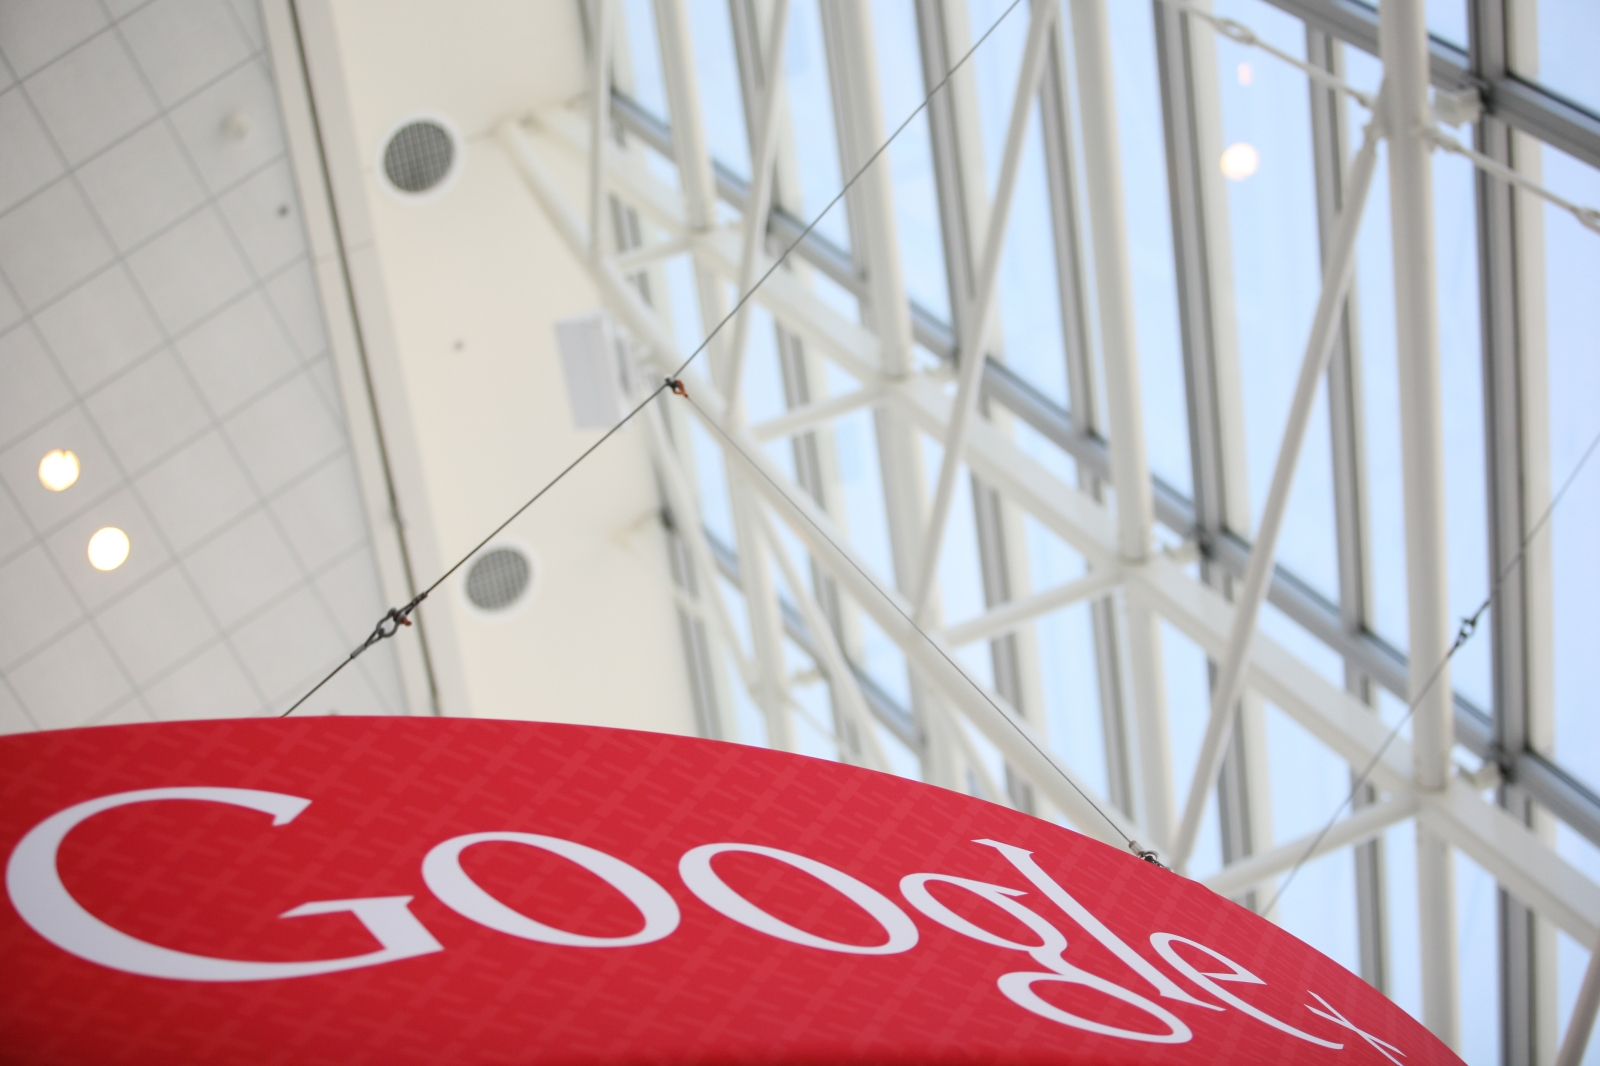 Indonesia raids Google's Jakarta office